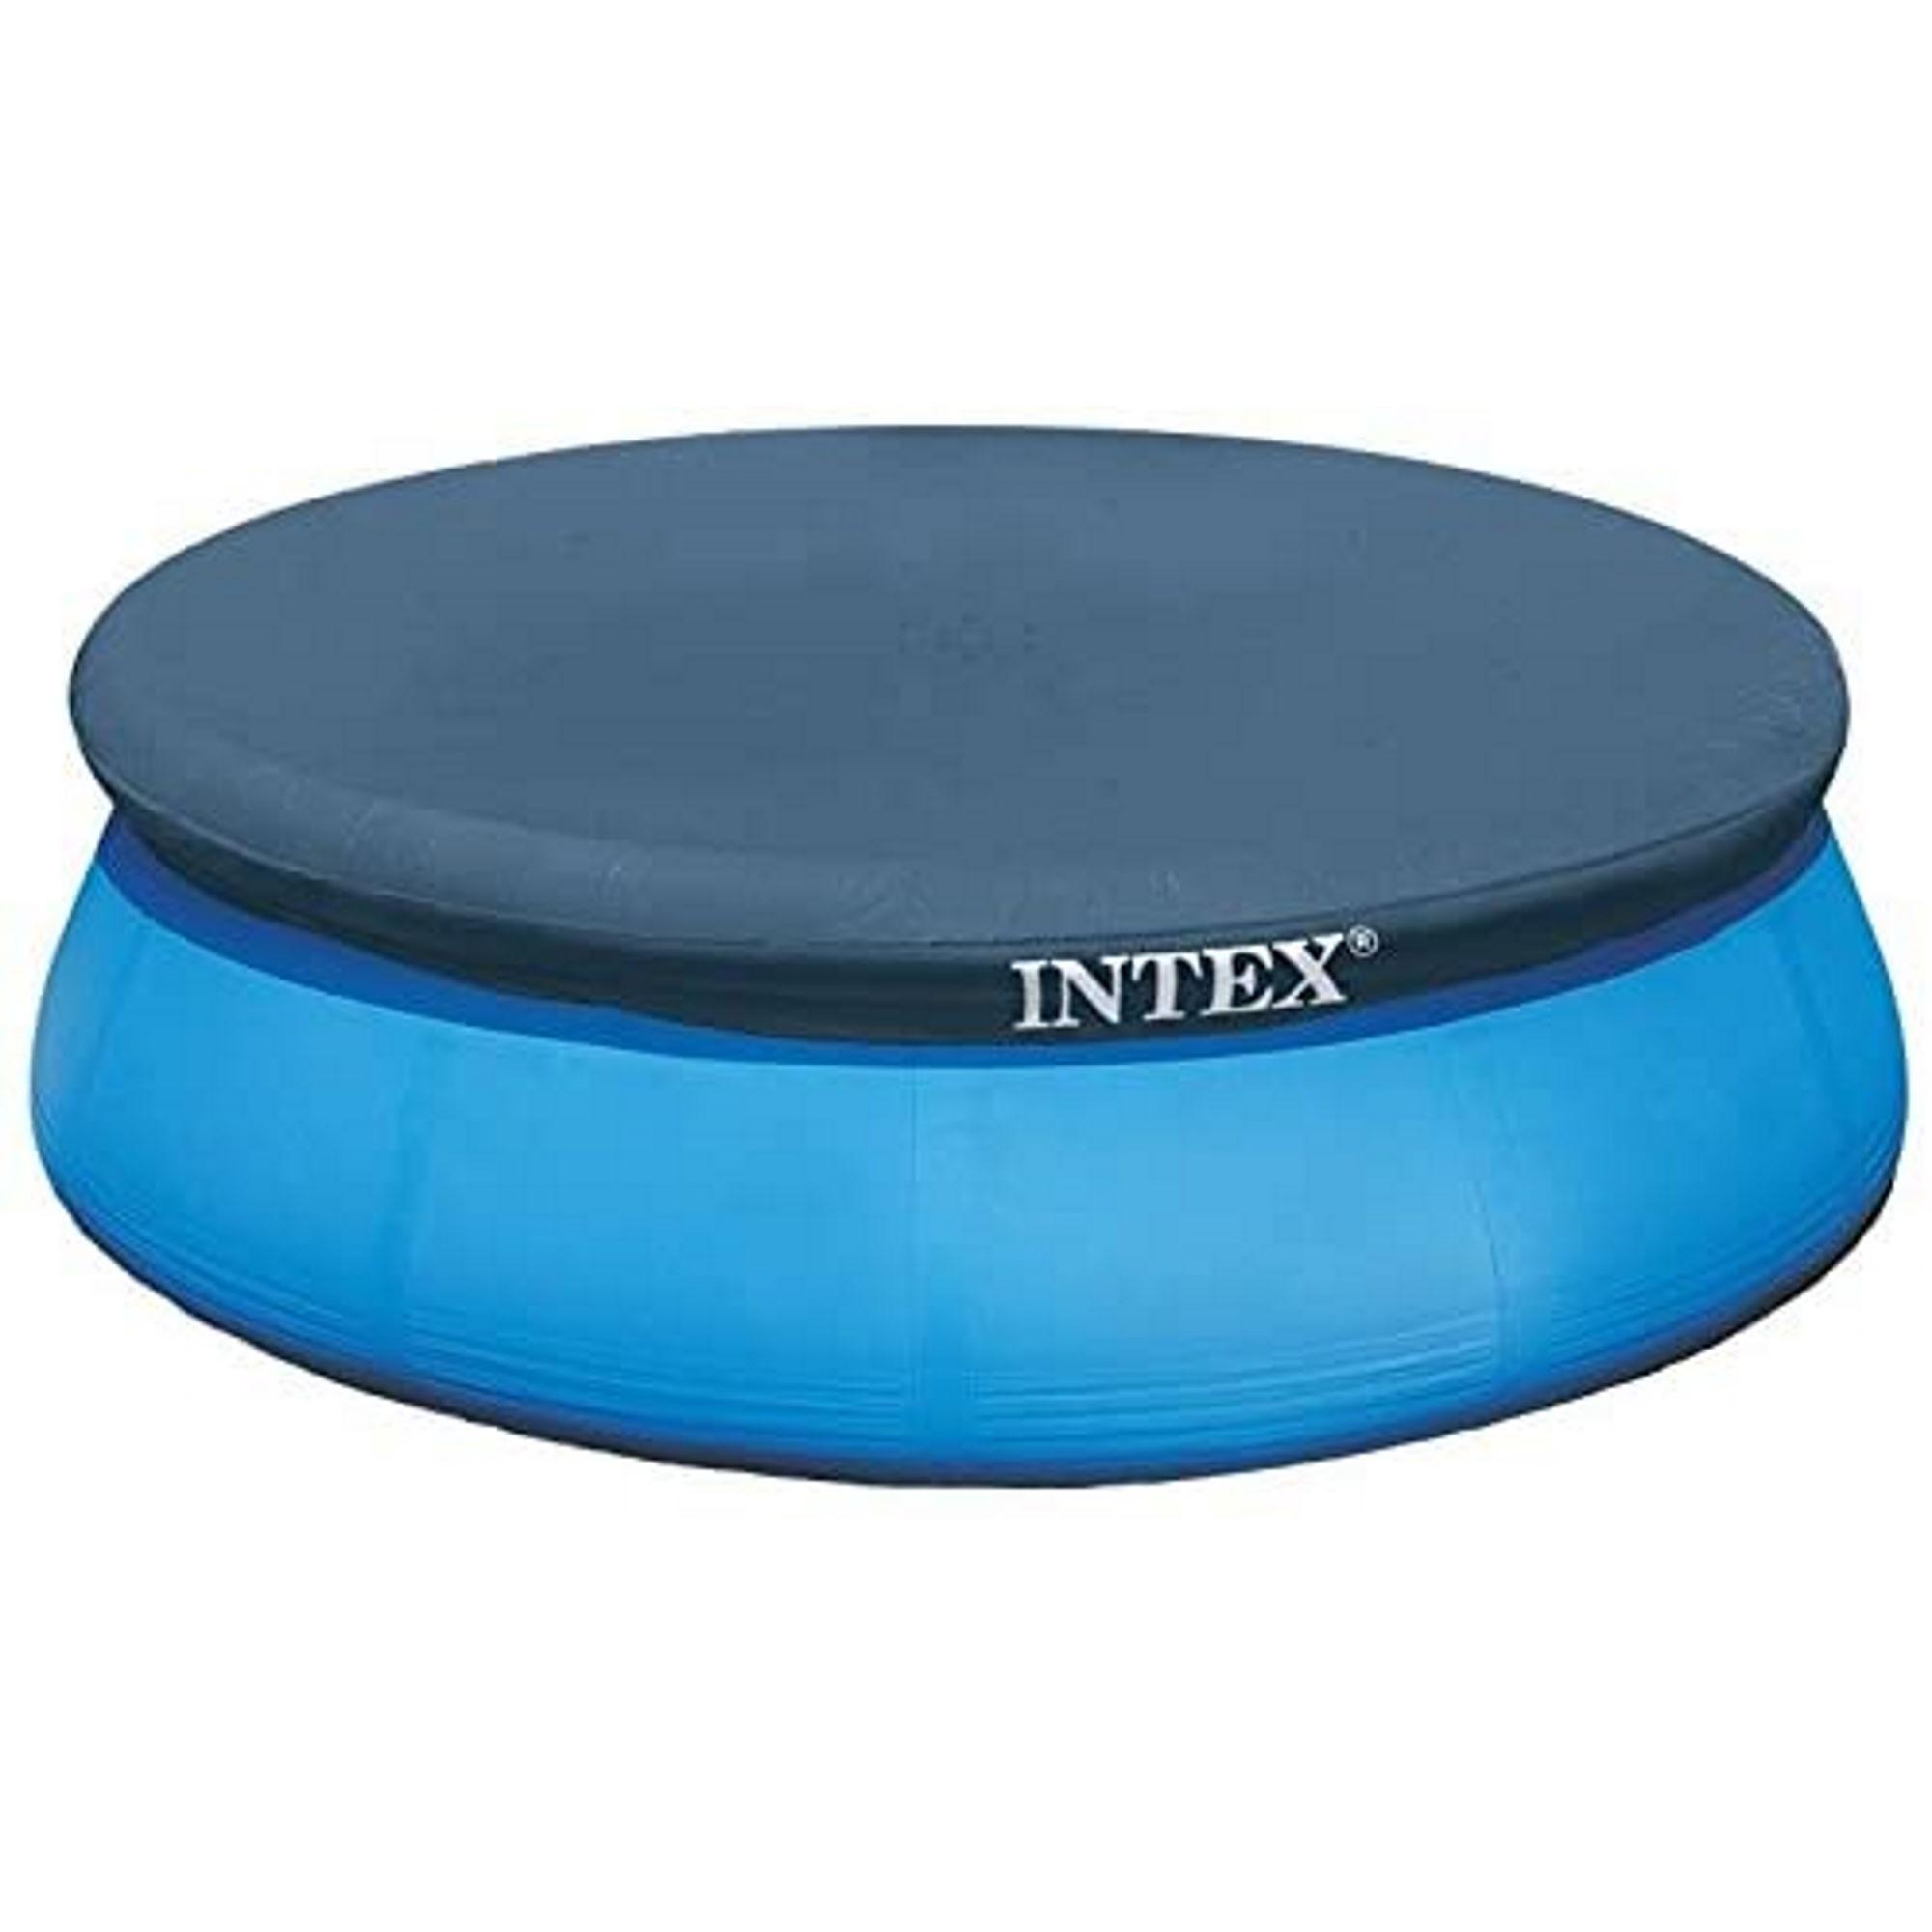 Intex 28021 Easy Set Pool-Abdeckung Ø2,84 m für Ø 3,05m